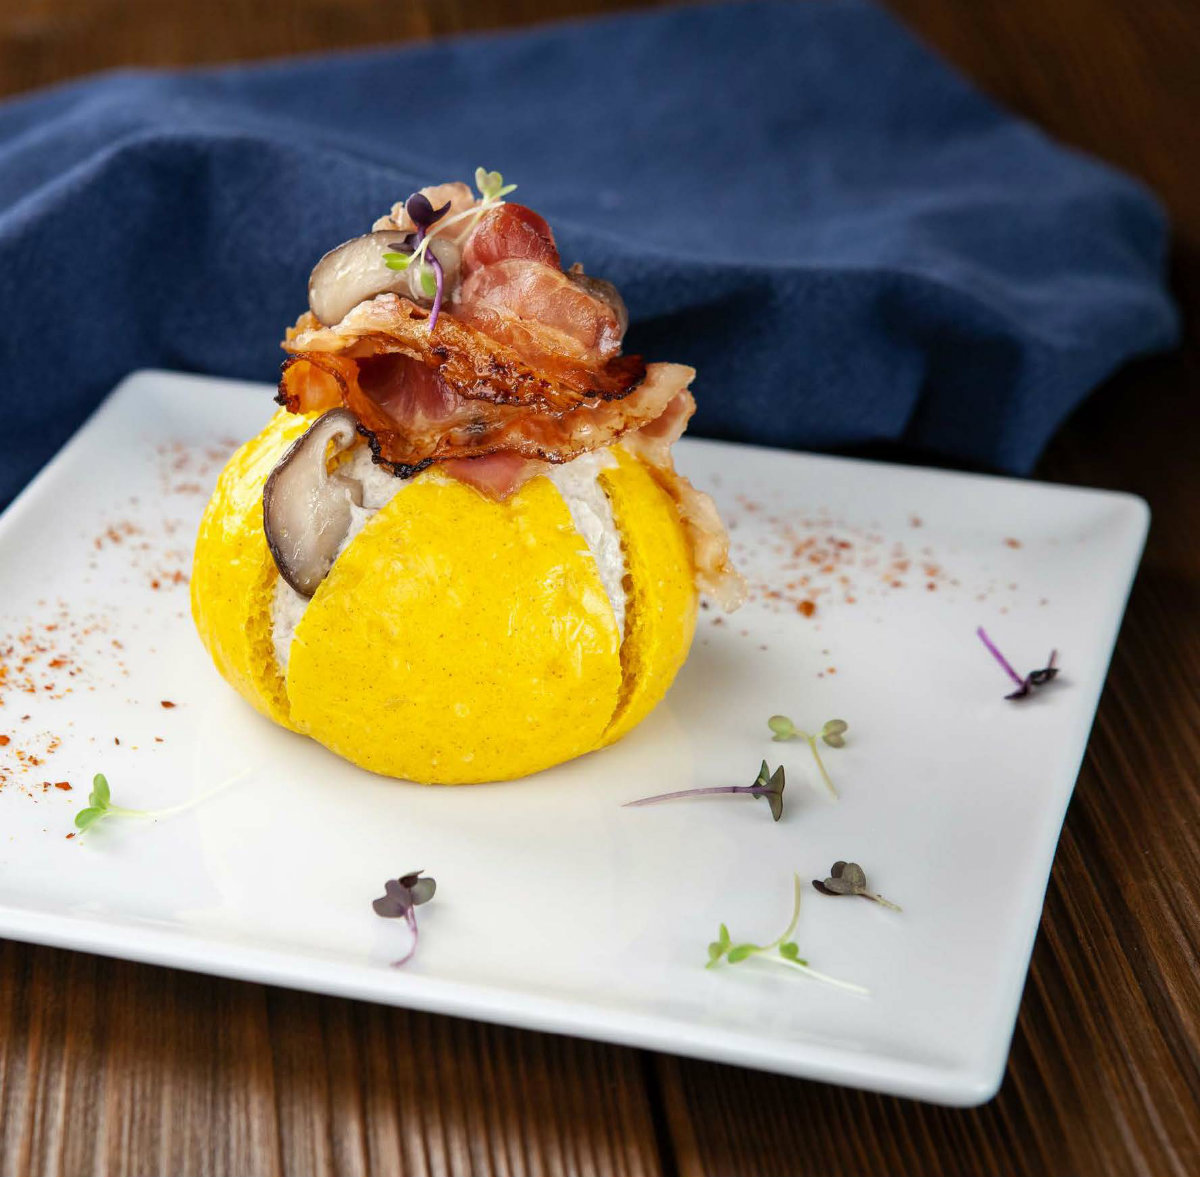 food lifestyle renato bosco 2